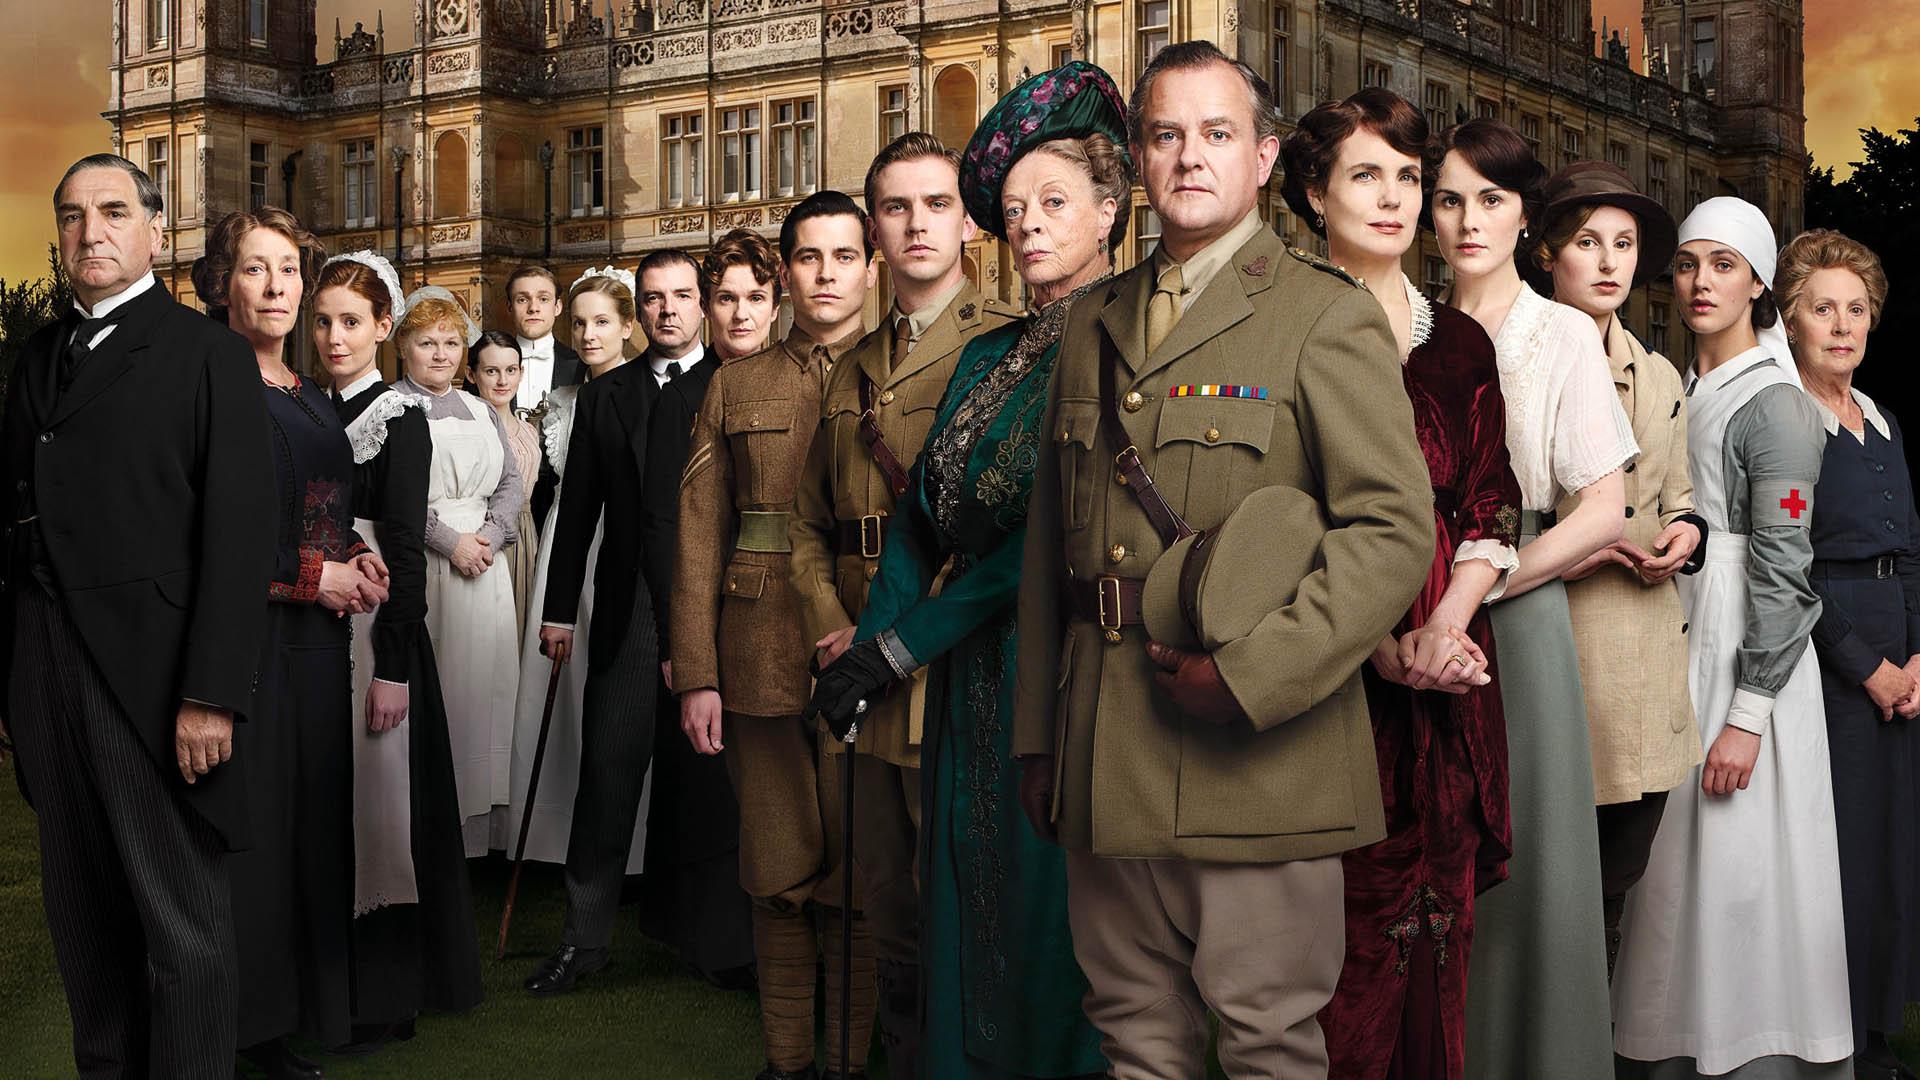 Downton-Abbey-series-2-cast-promo.jpg